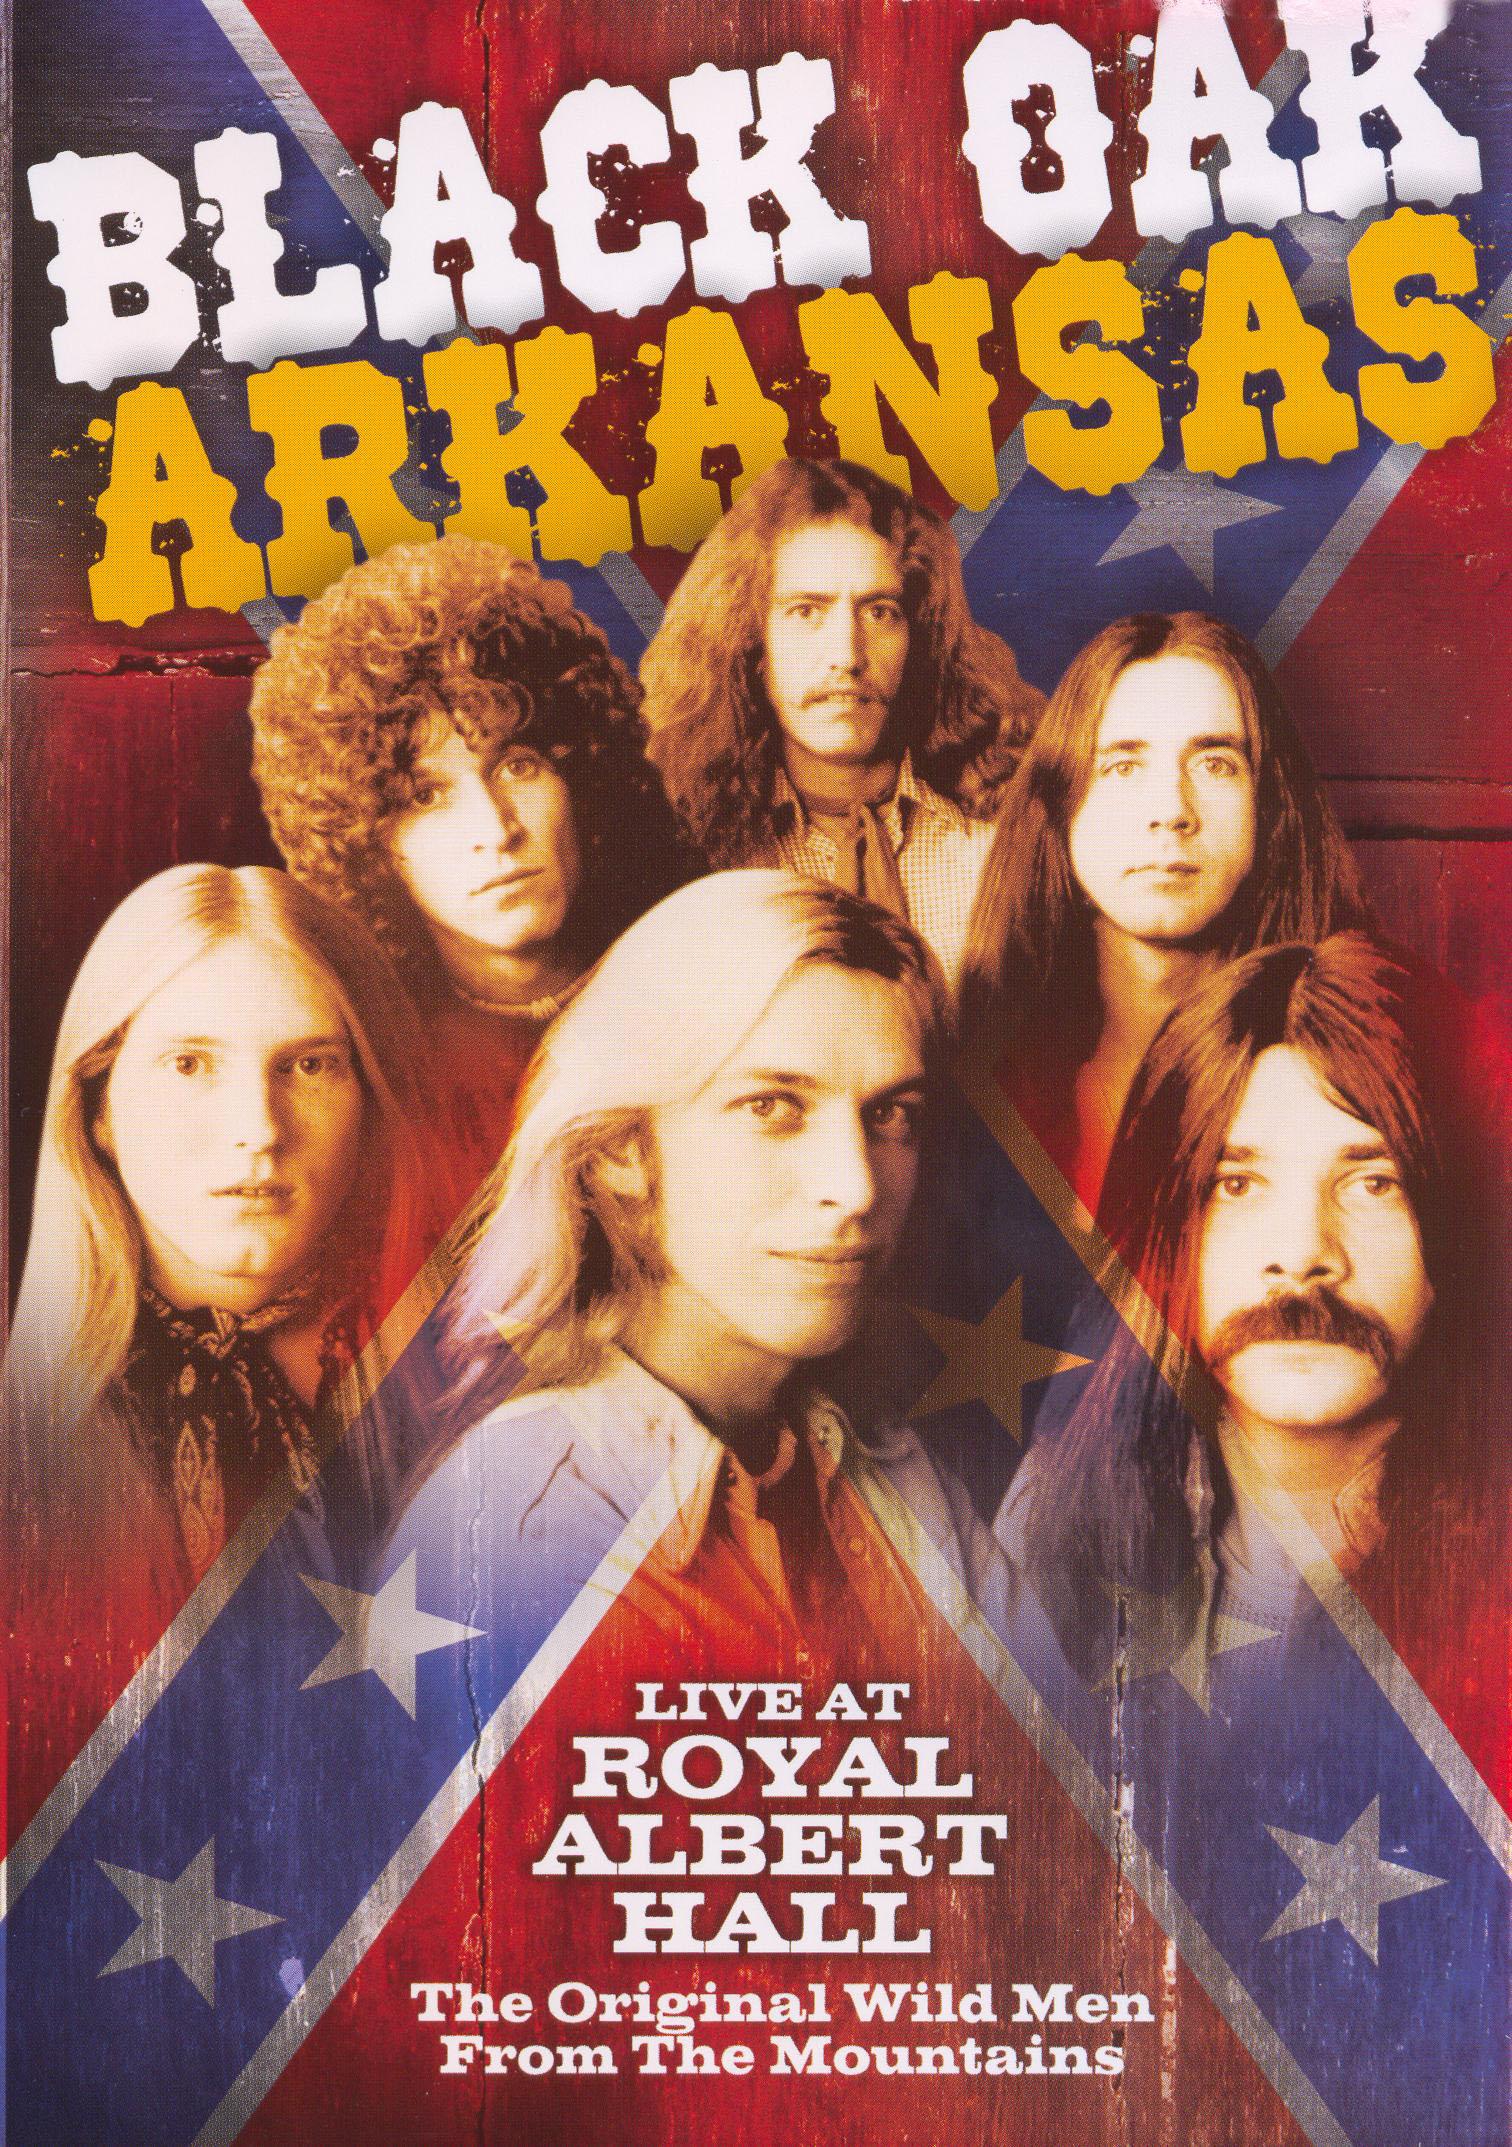 Black Oak Arkansas: Live at Royal Albert Hall